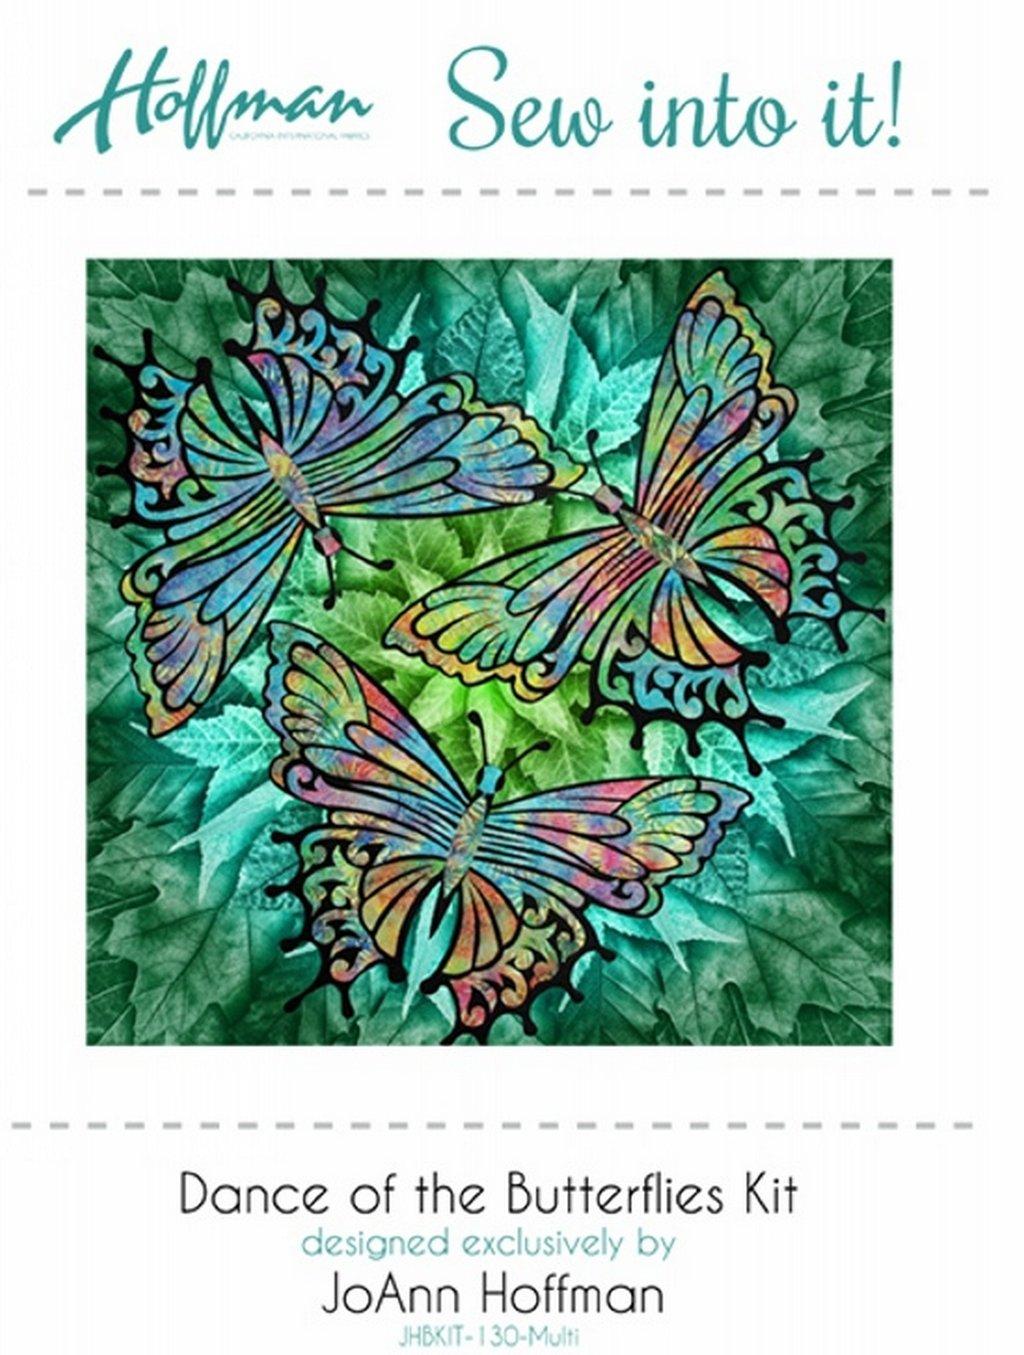 Dance of the Butterflies Kit - A Hoffman Sew into It! Kit